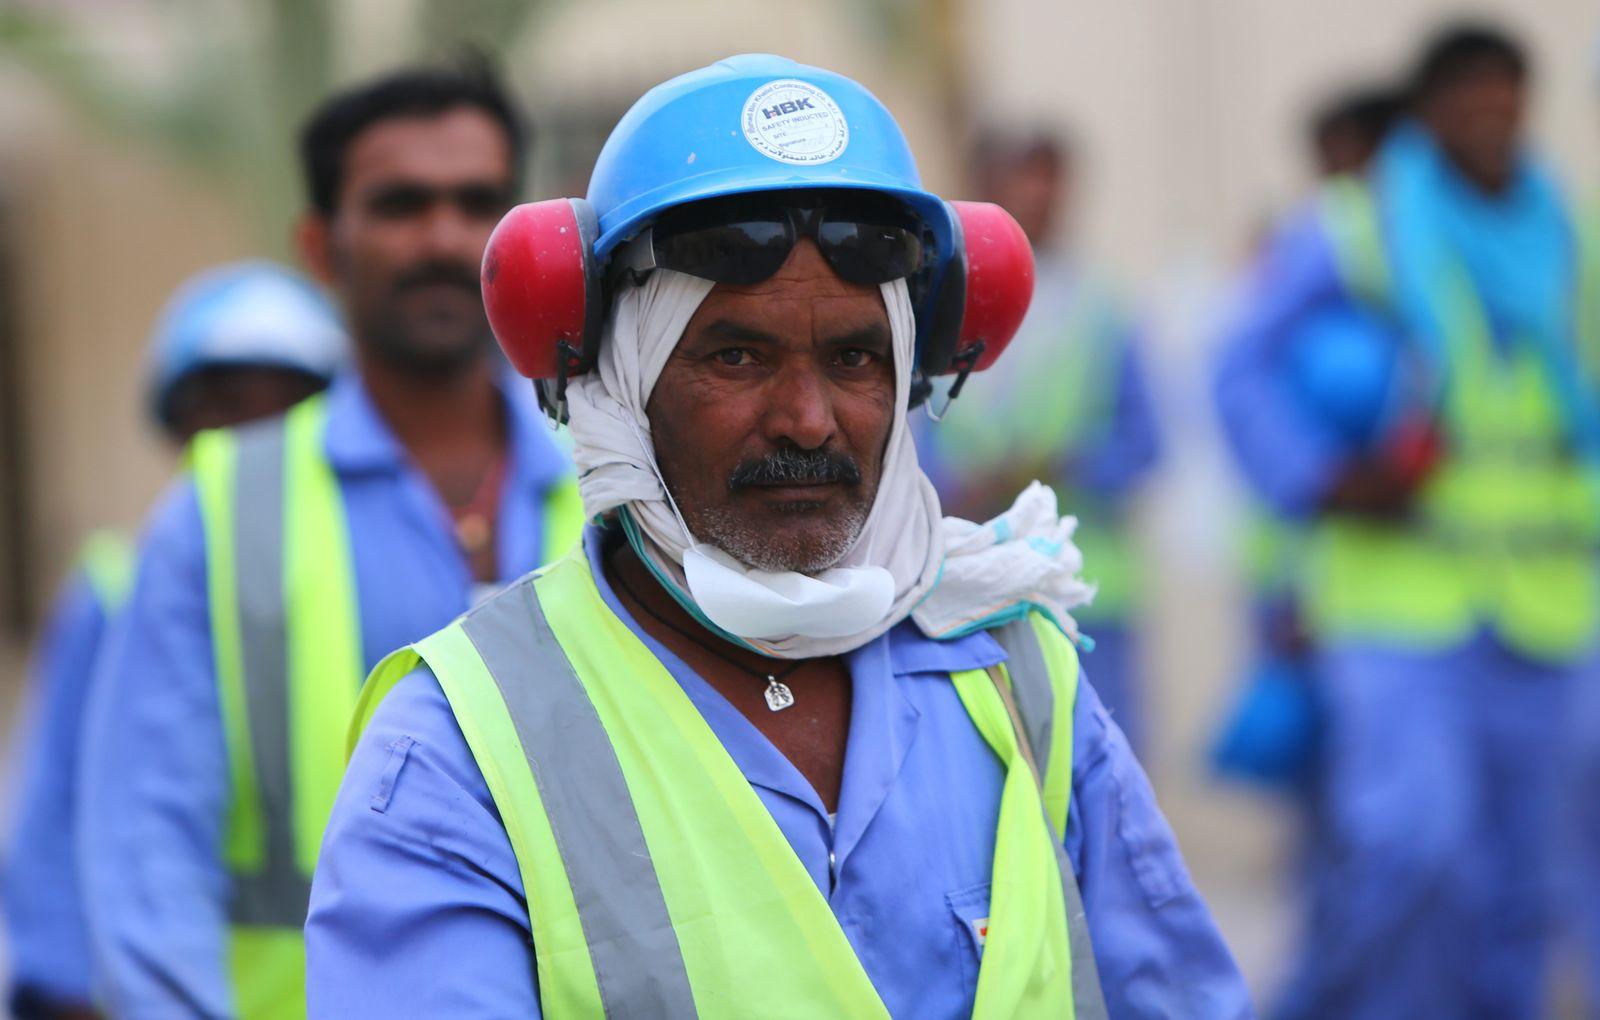 Katar/ Arbeiter/ Baustelle